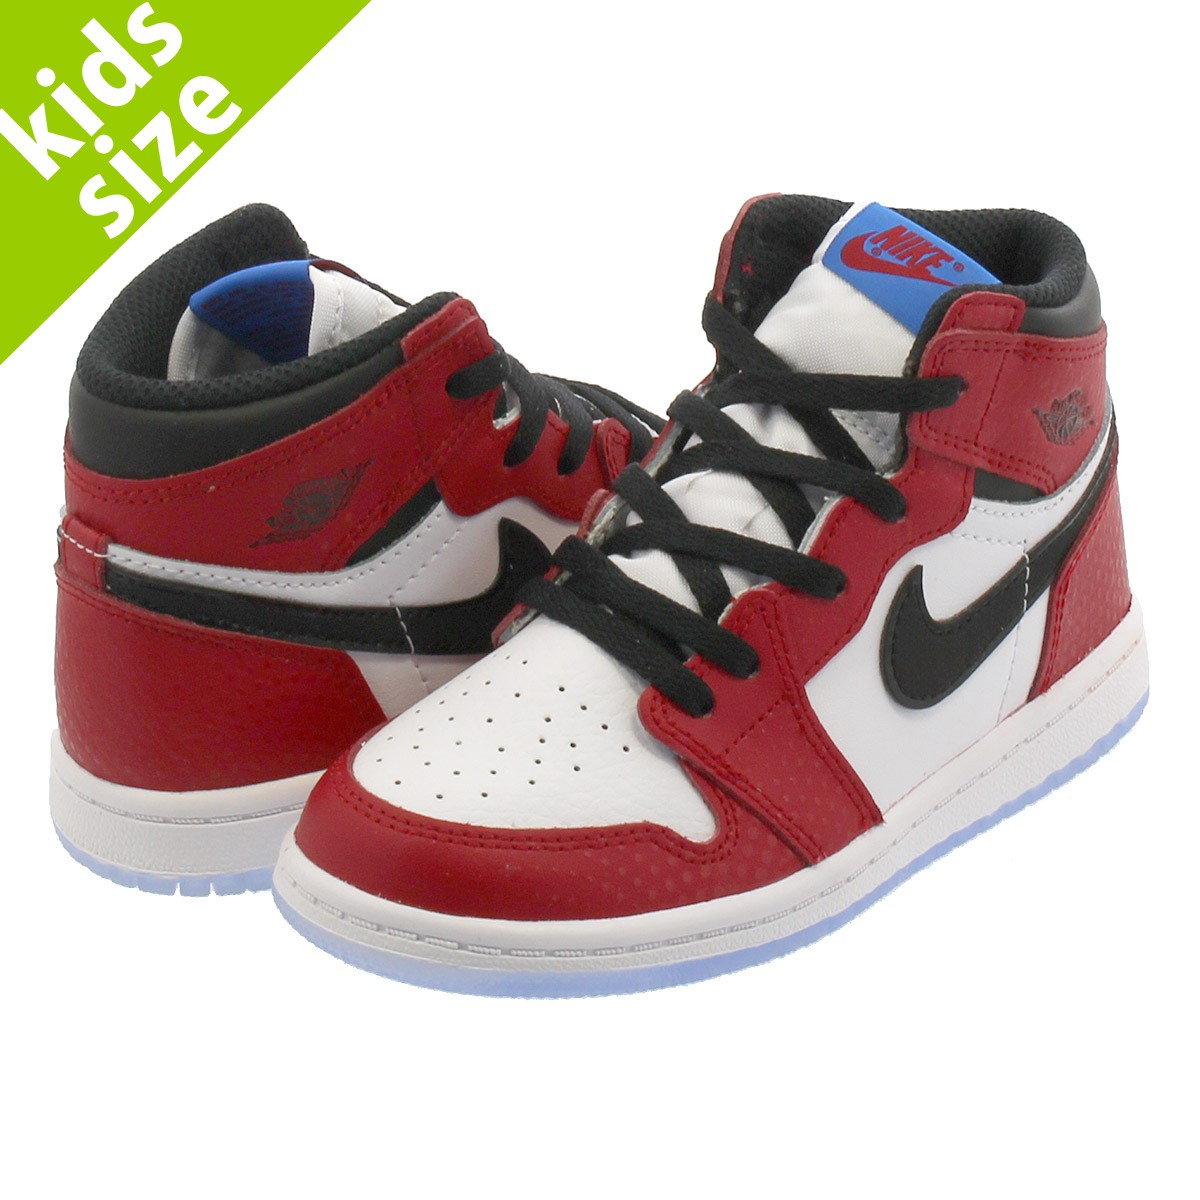 989b811cdf5568 NIKE AIR JORDAN 1 RETRO HIGH OG BT Nike Air Jordan 1 nostalgic high OG BT  GYM RED WHITE PHOTO BLUE BLACK aq2665-602